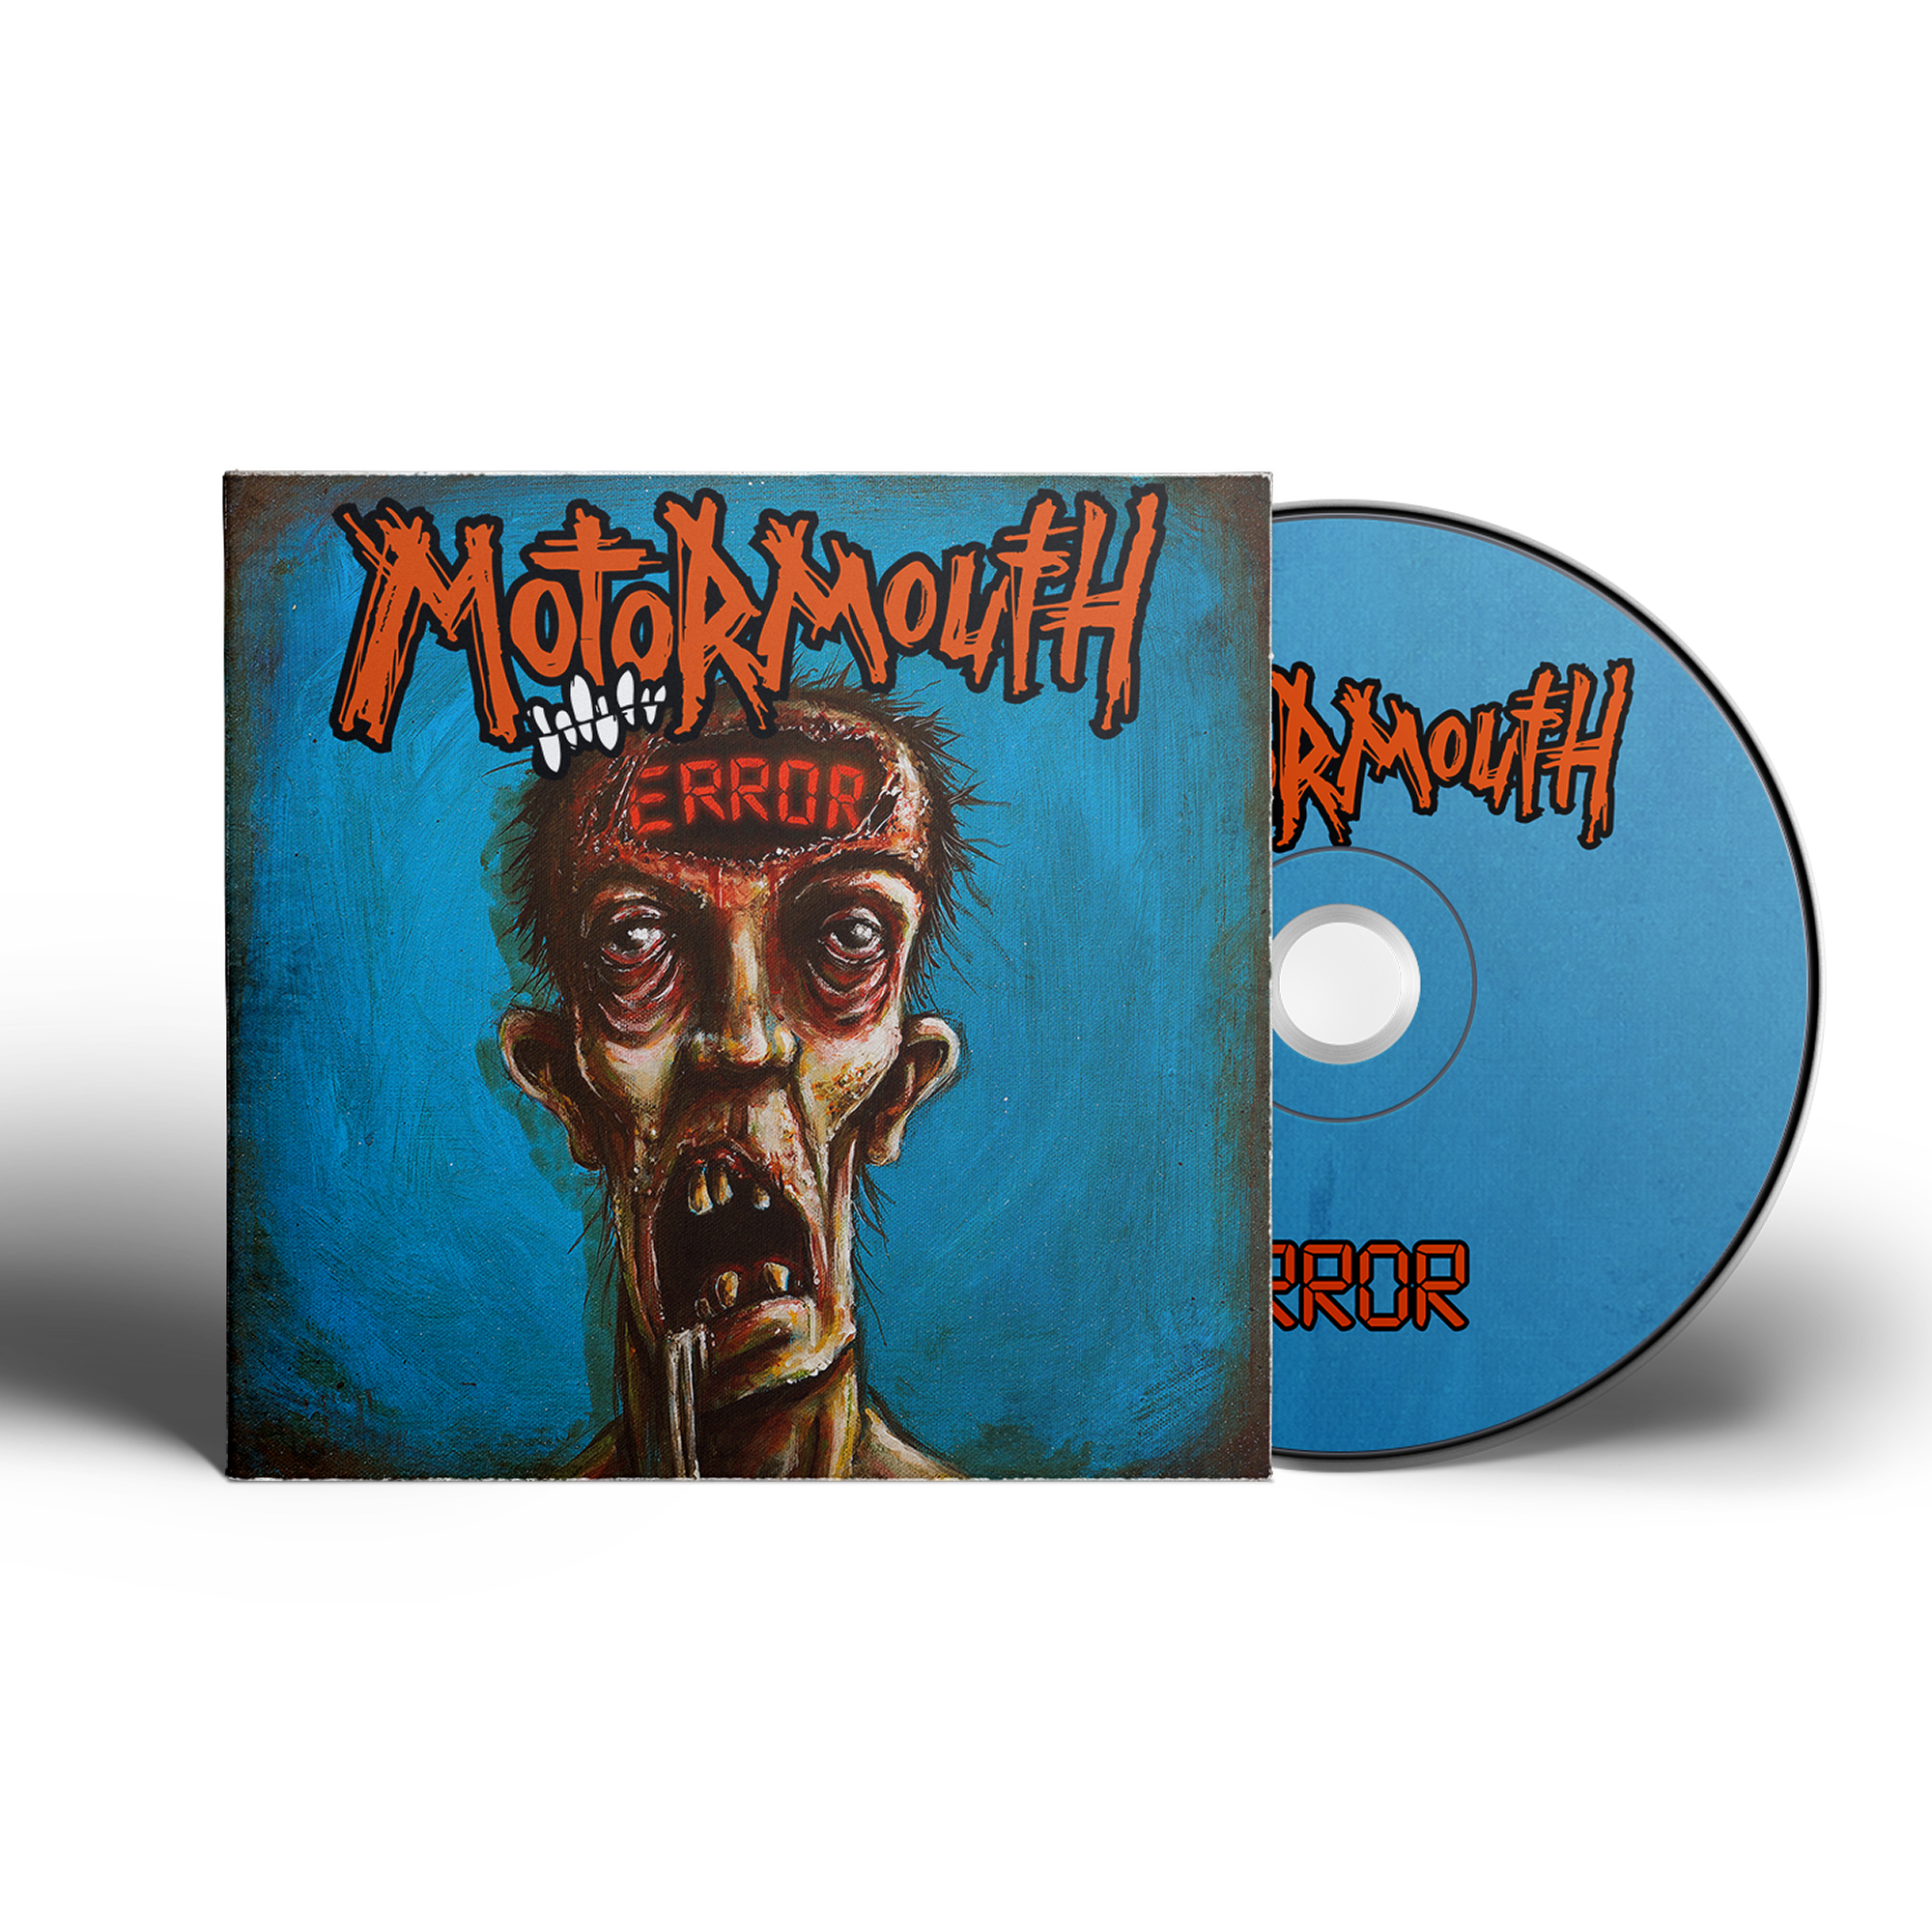 Motormouth - Error